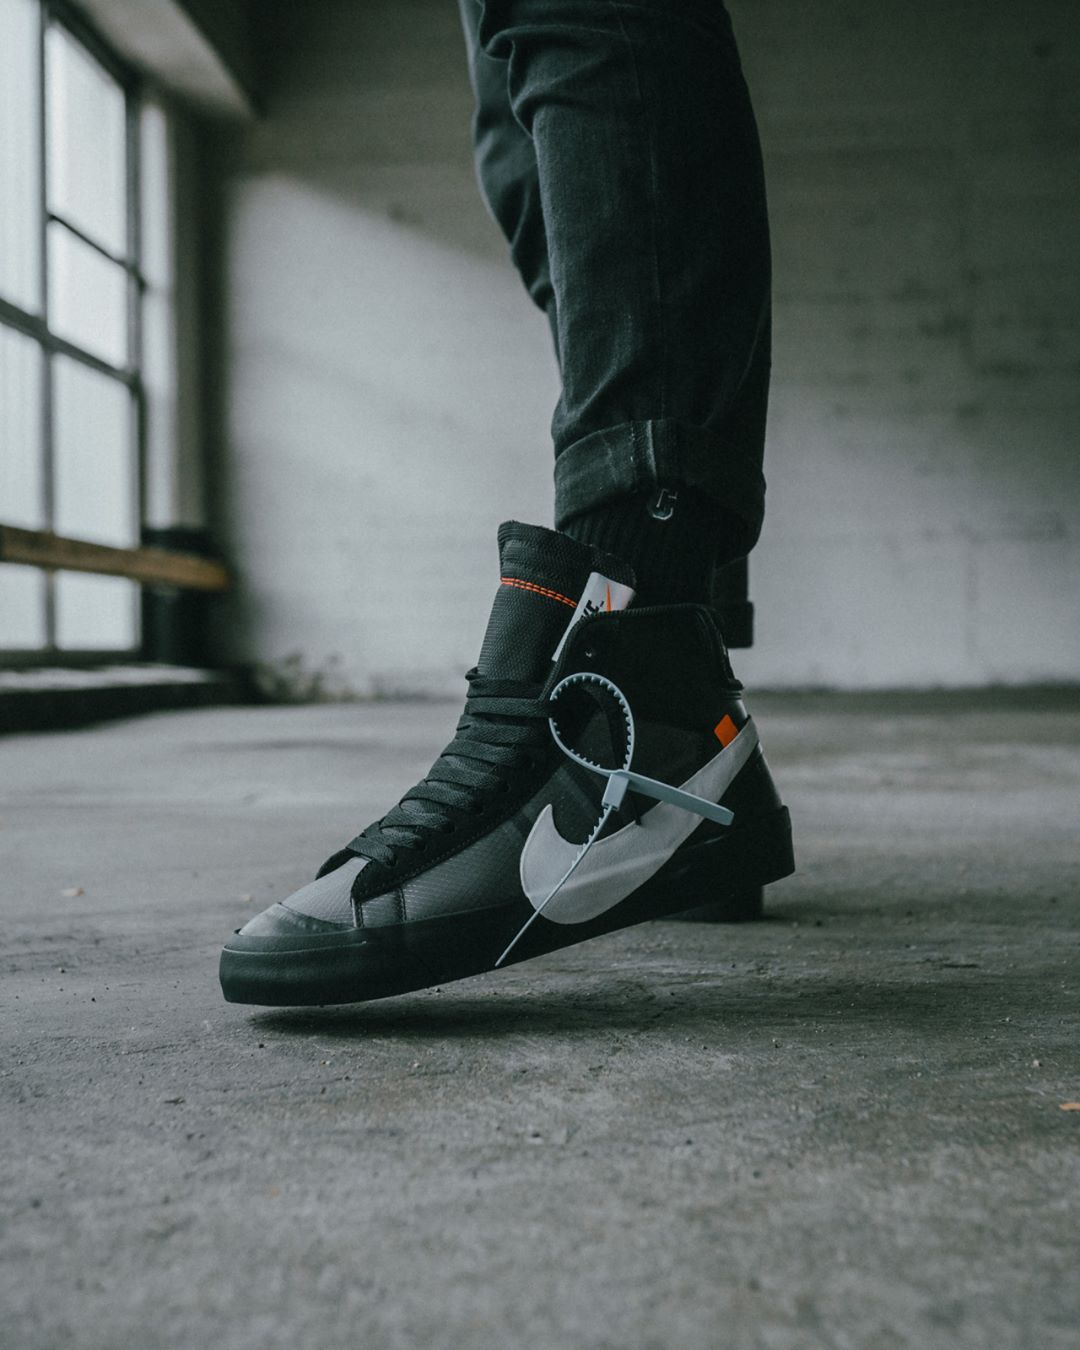 bbebbe75e Pin by Hi on shoes in 2019 | Nike blazer black, Off white blazer ...